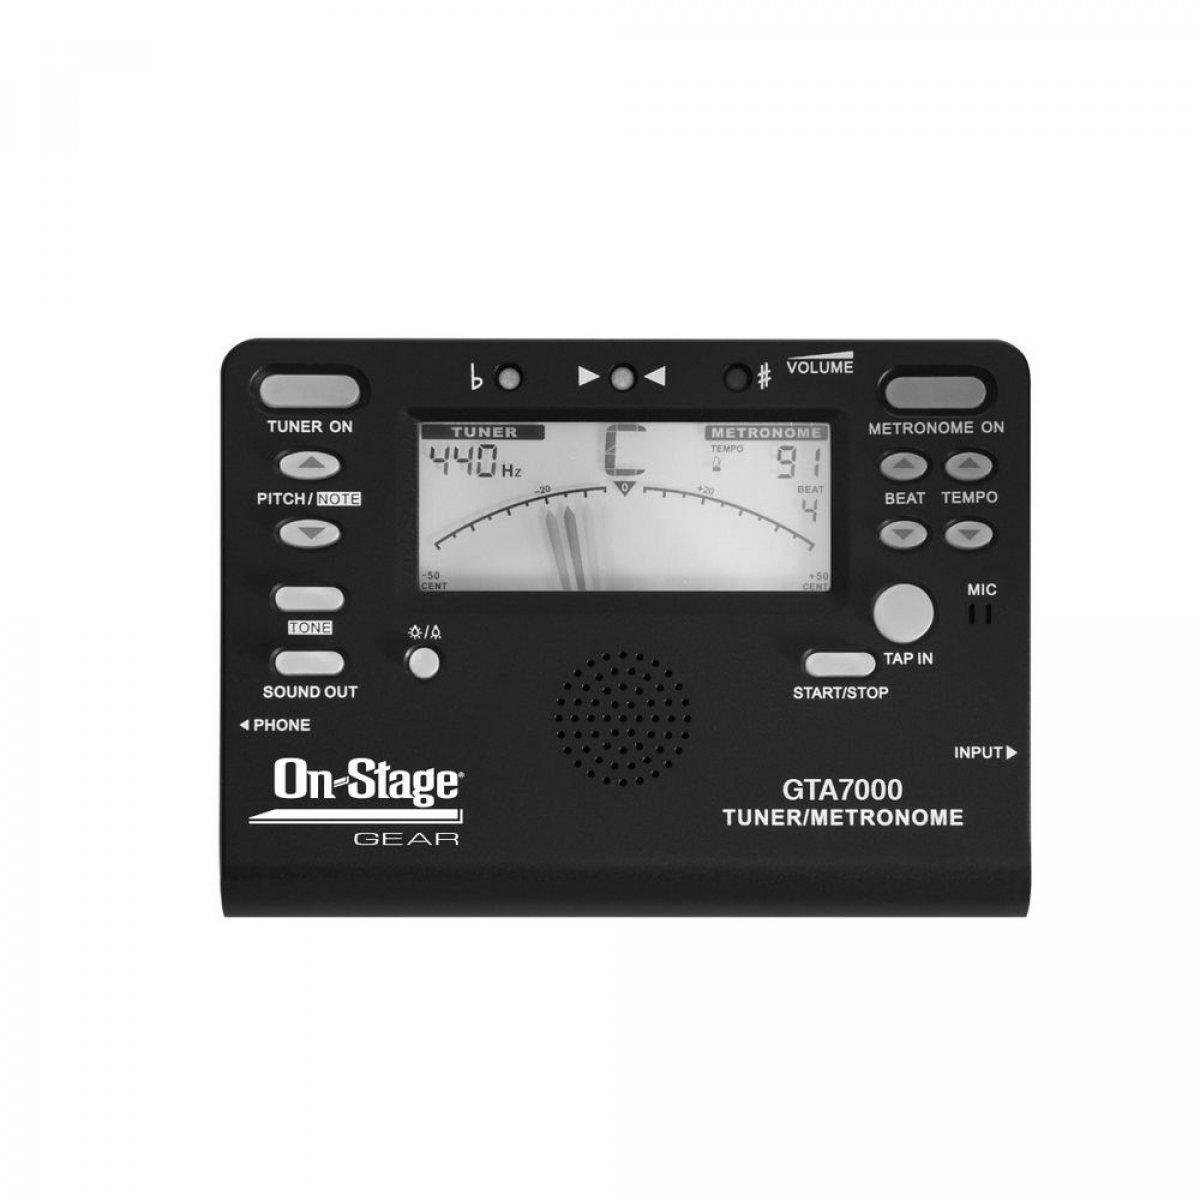 Chromatic Tuner Metronome & Tone Generator